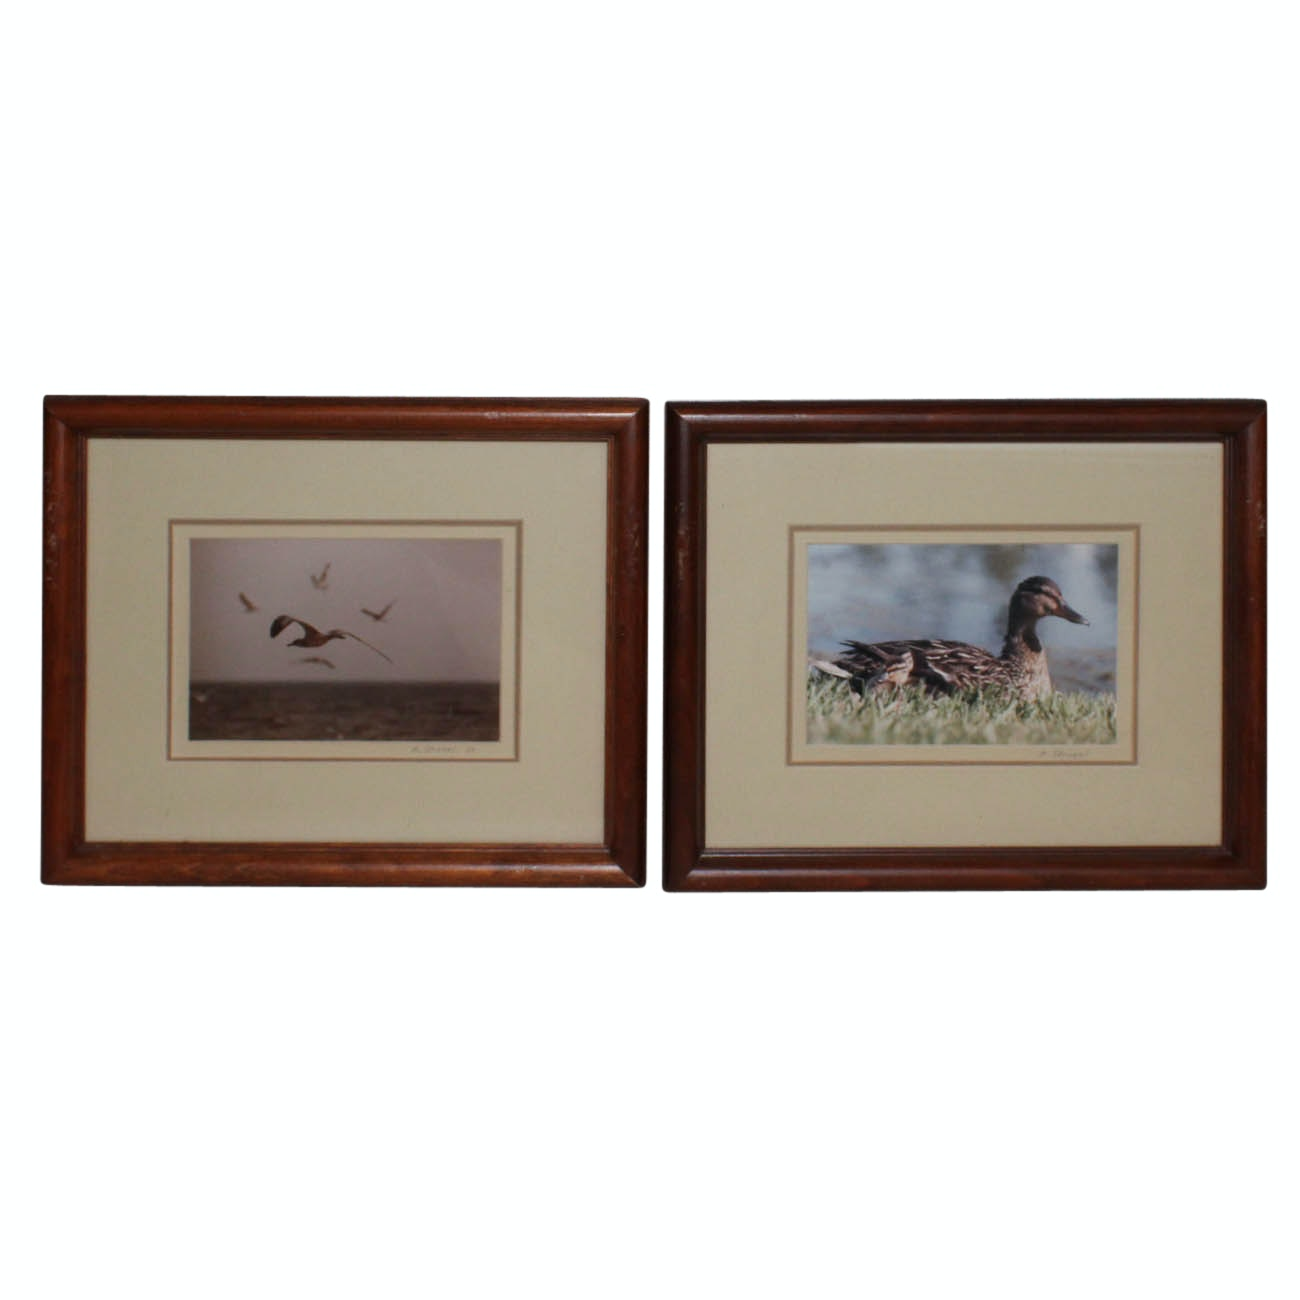 Two Framed M. Strobel Photographic Prints